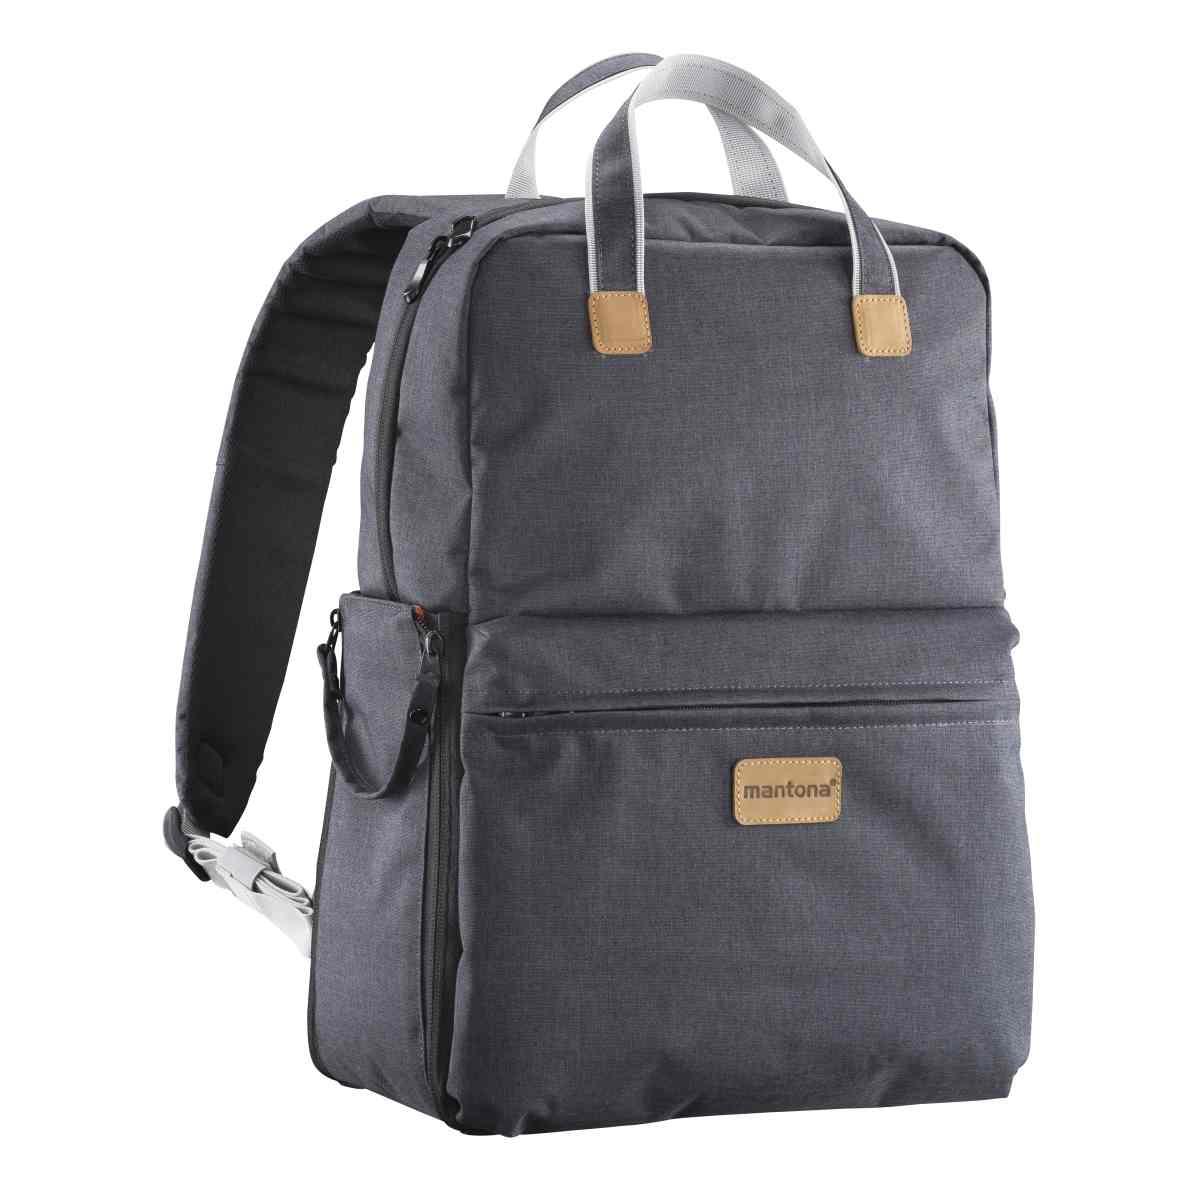 urban companion photo backpack & bag 2 in 1